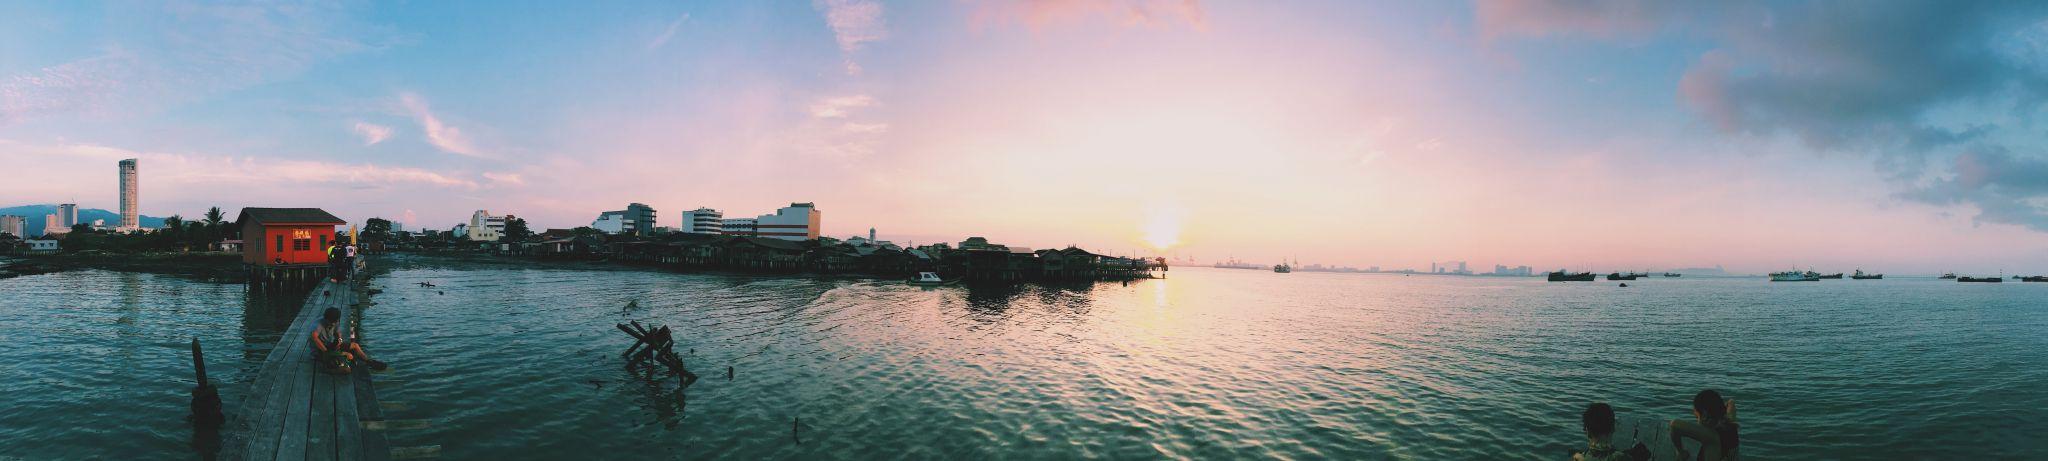 Infamous clan jetty, Malaysia